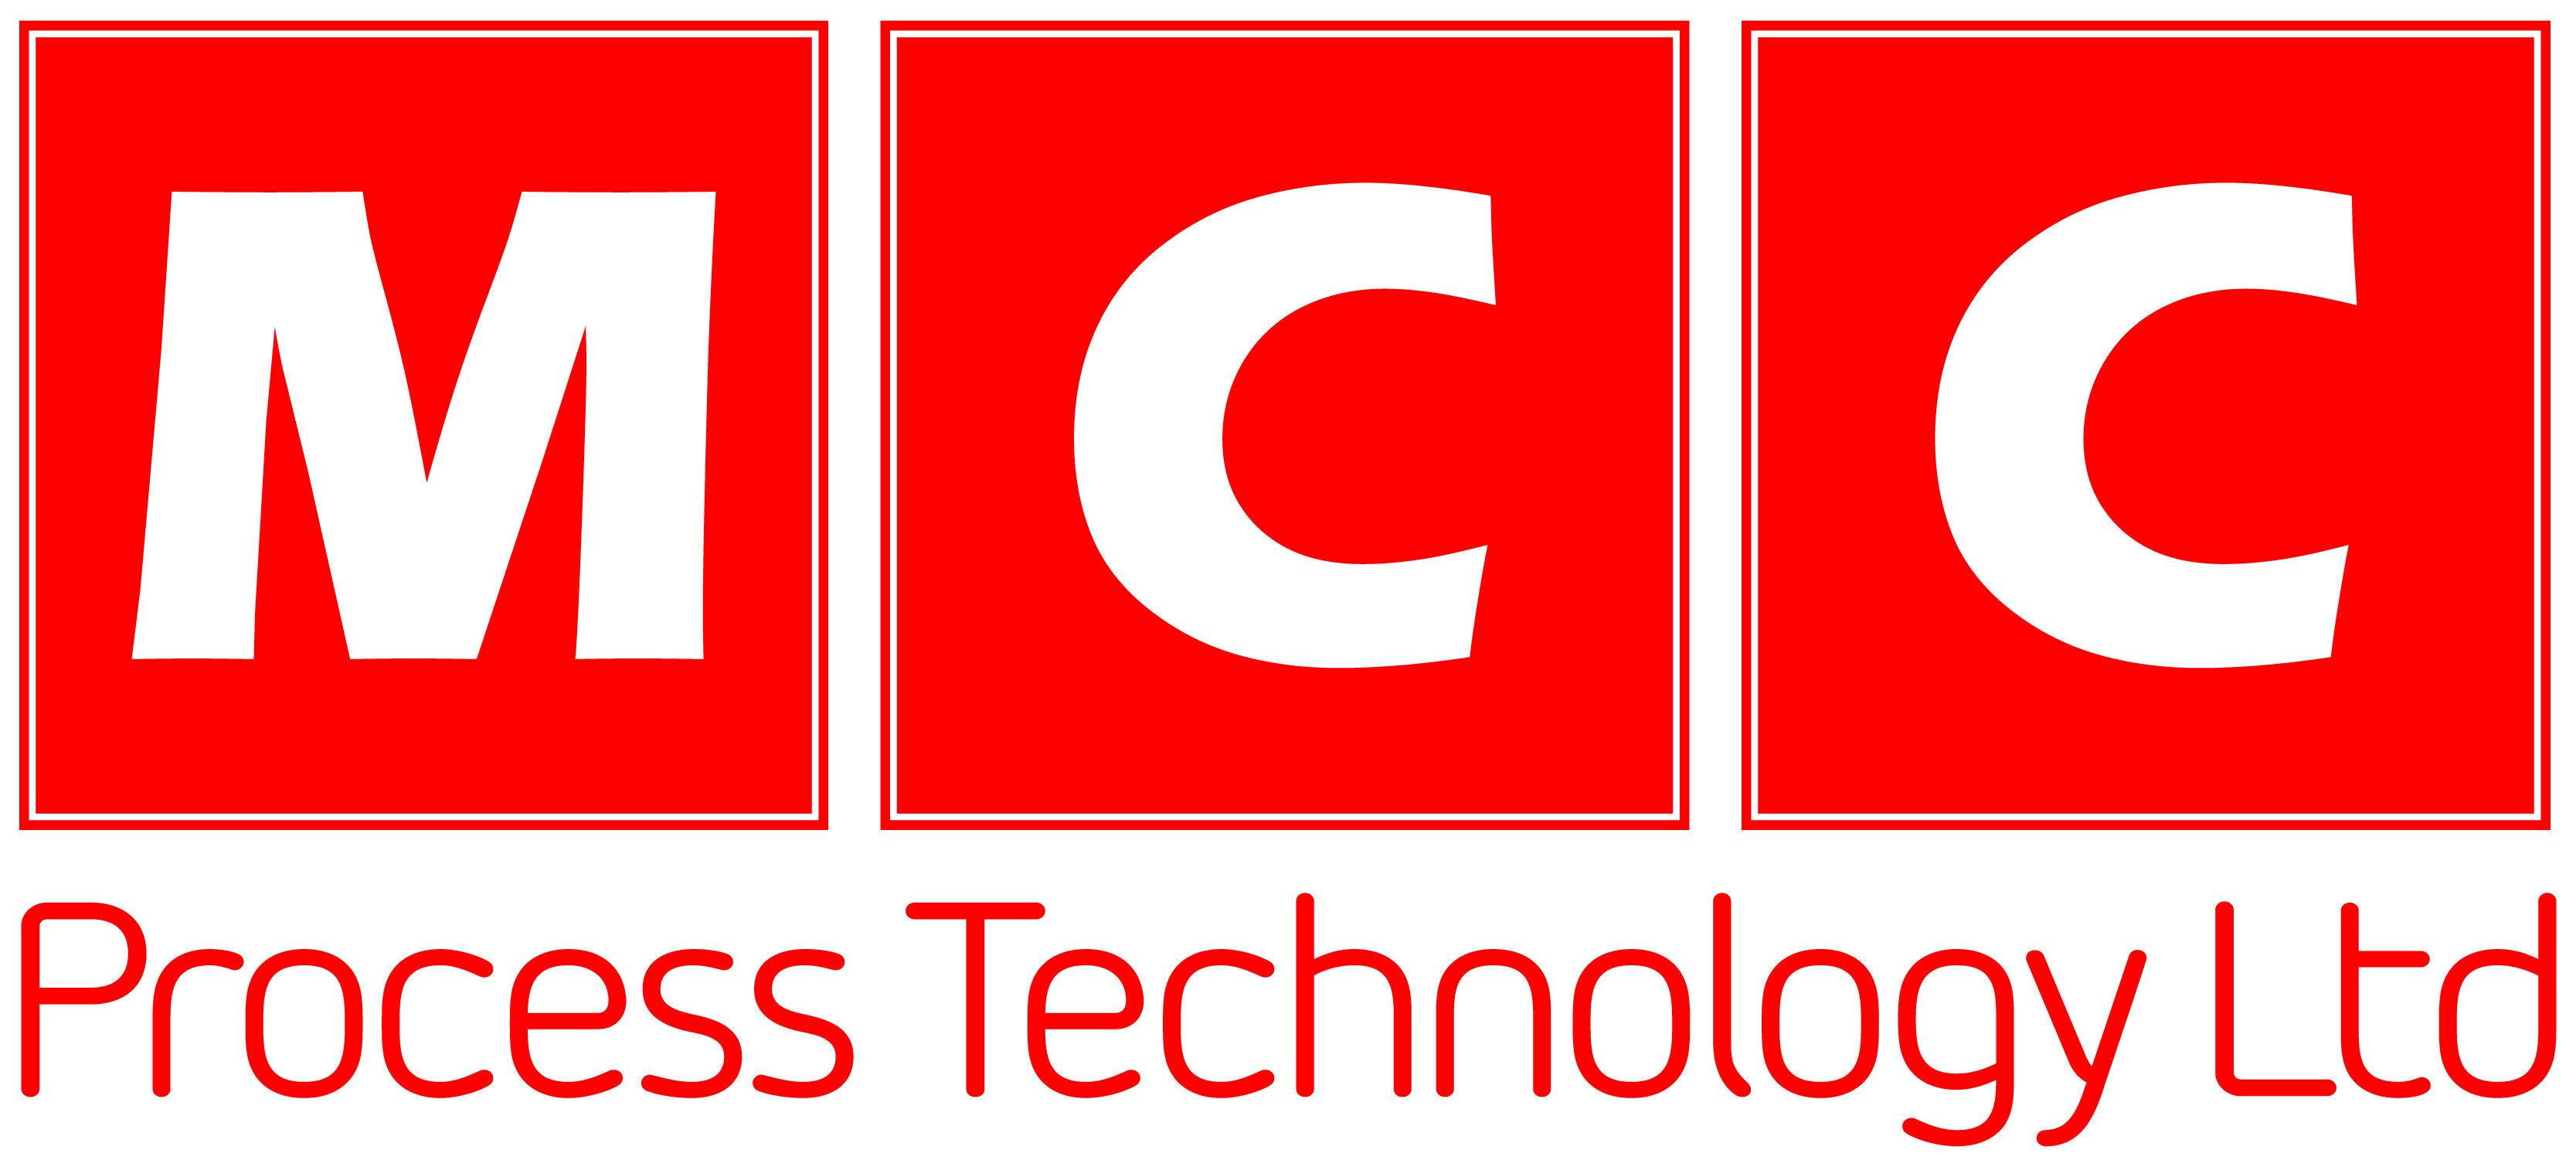 MCC PROCESS TECHNOLOGY LTD